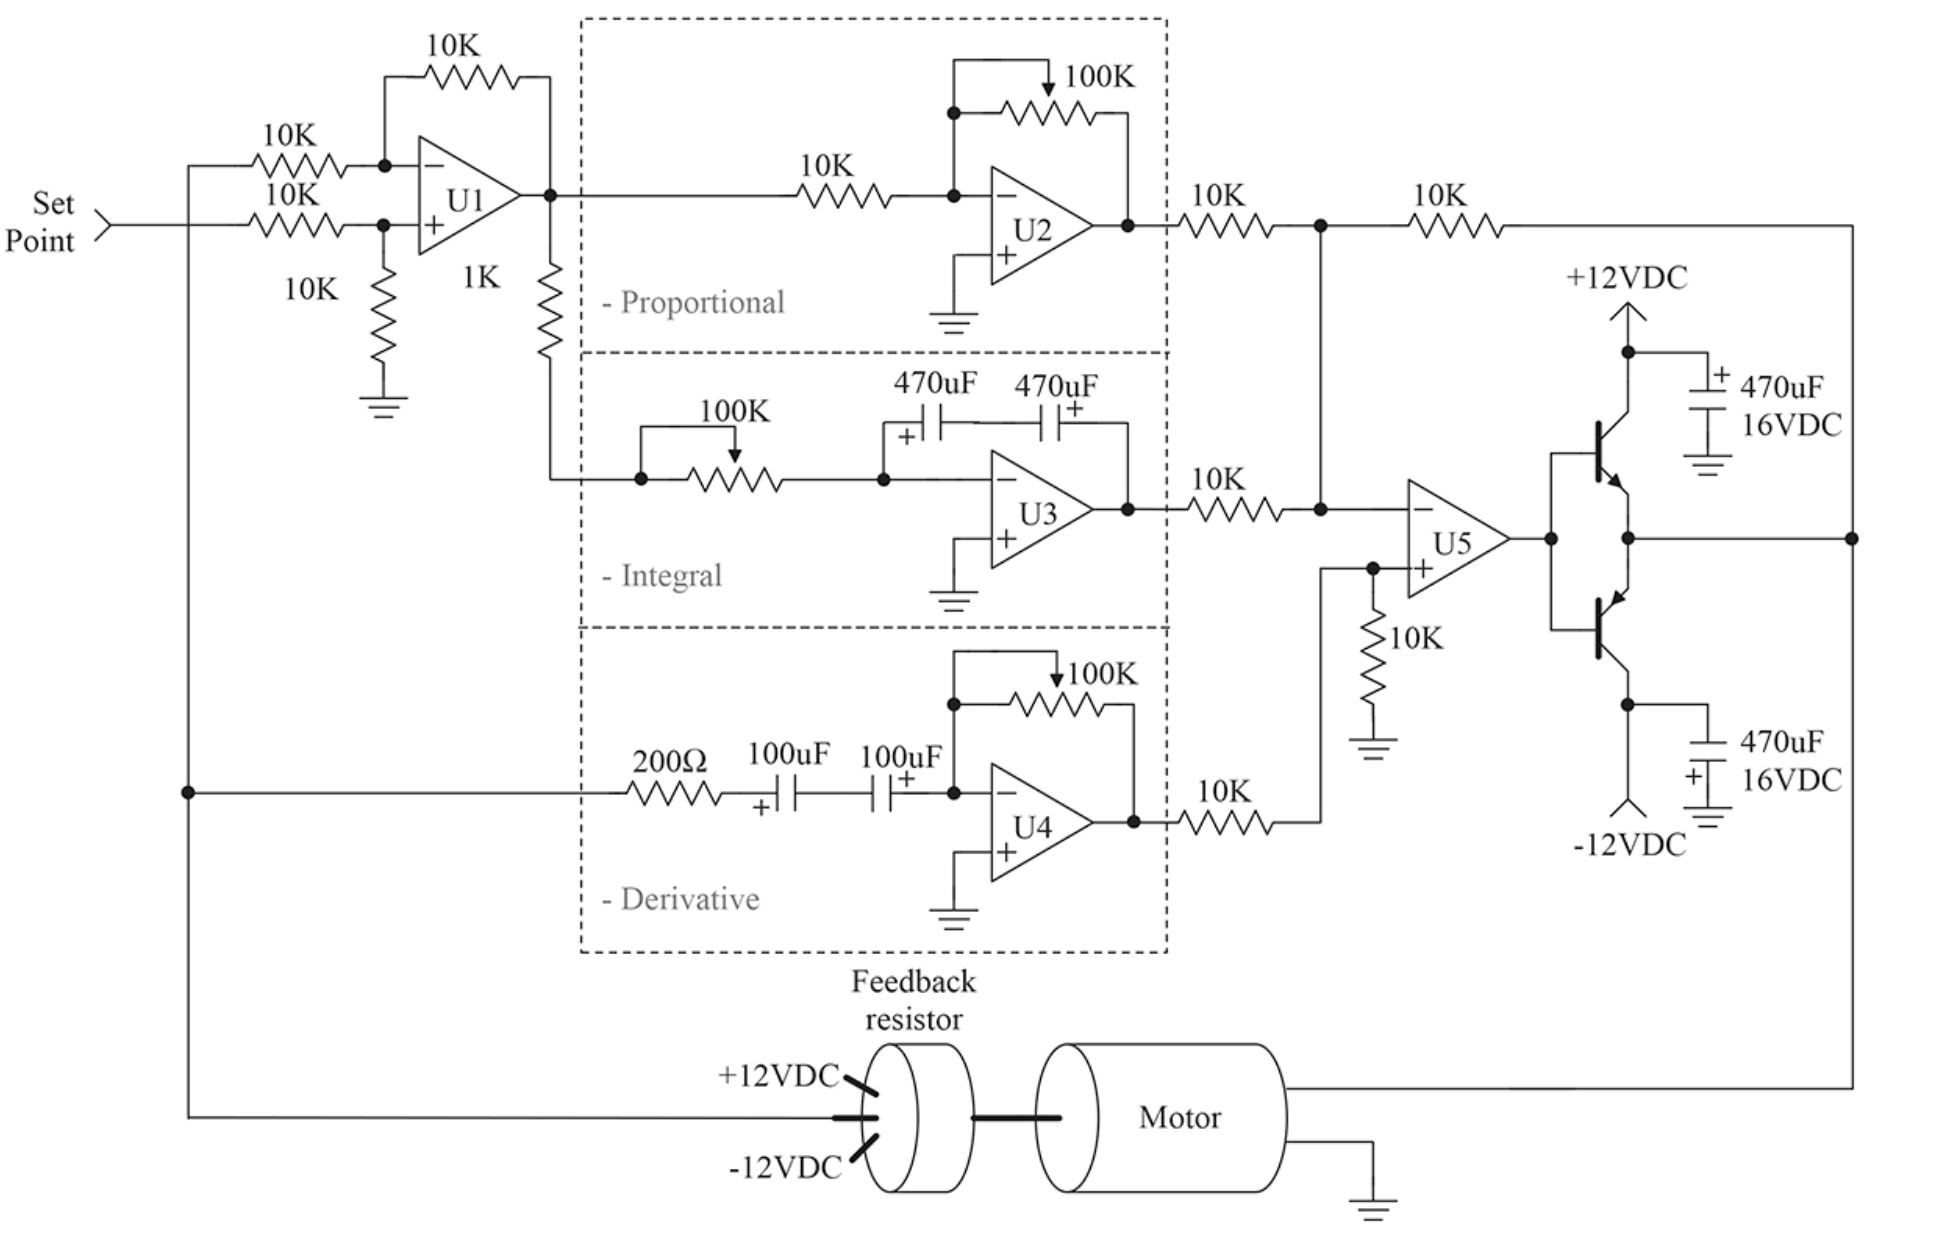 vox headset wiring diagram get free image about wiring diagram rh inspeere co Aircraft Headset Wiring Headset with Mic Wiring